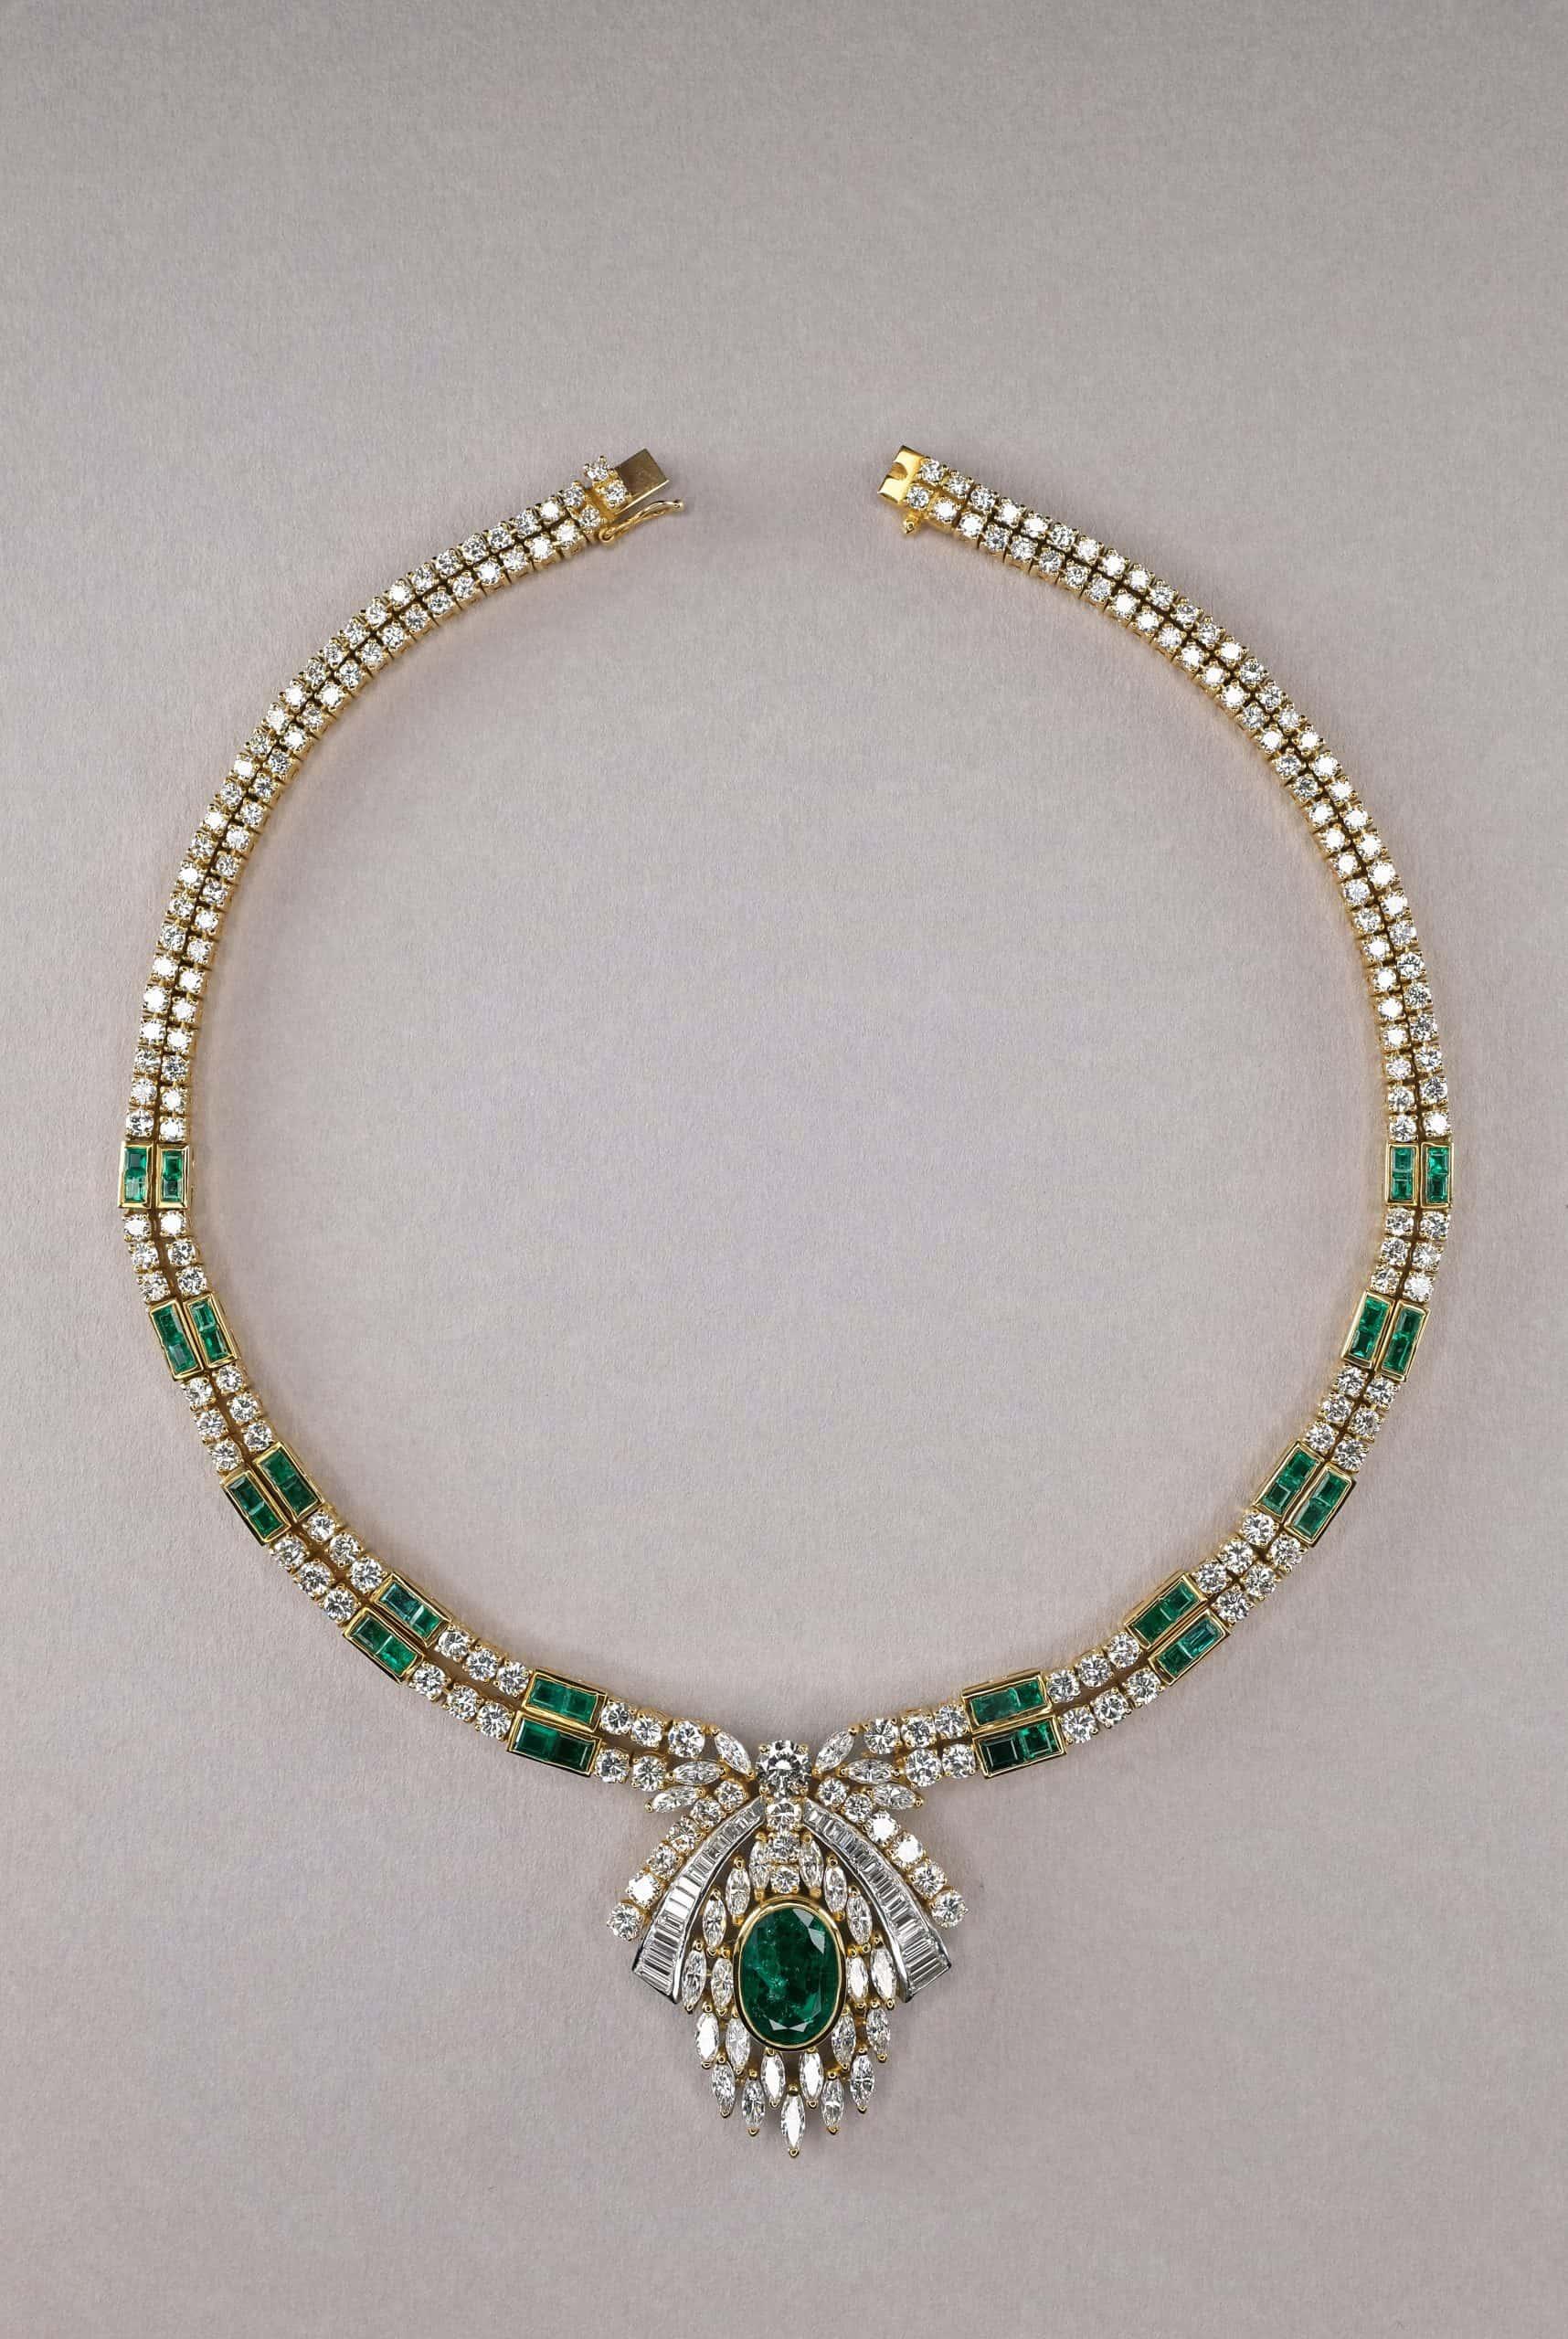 Vintage emerald necklace by Gembridge